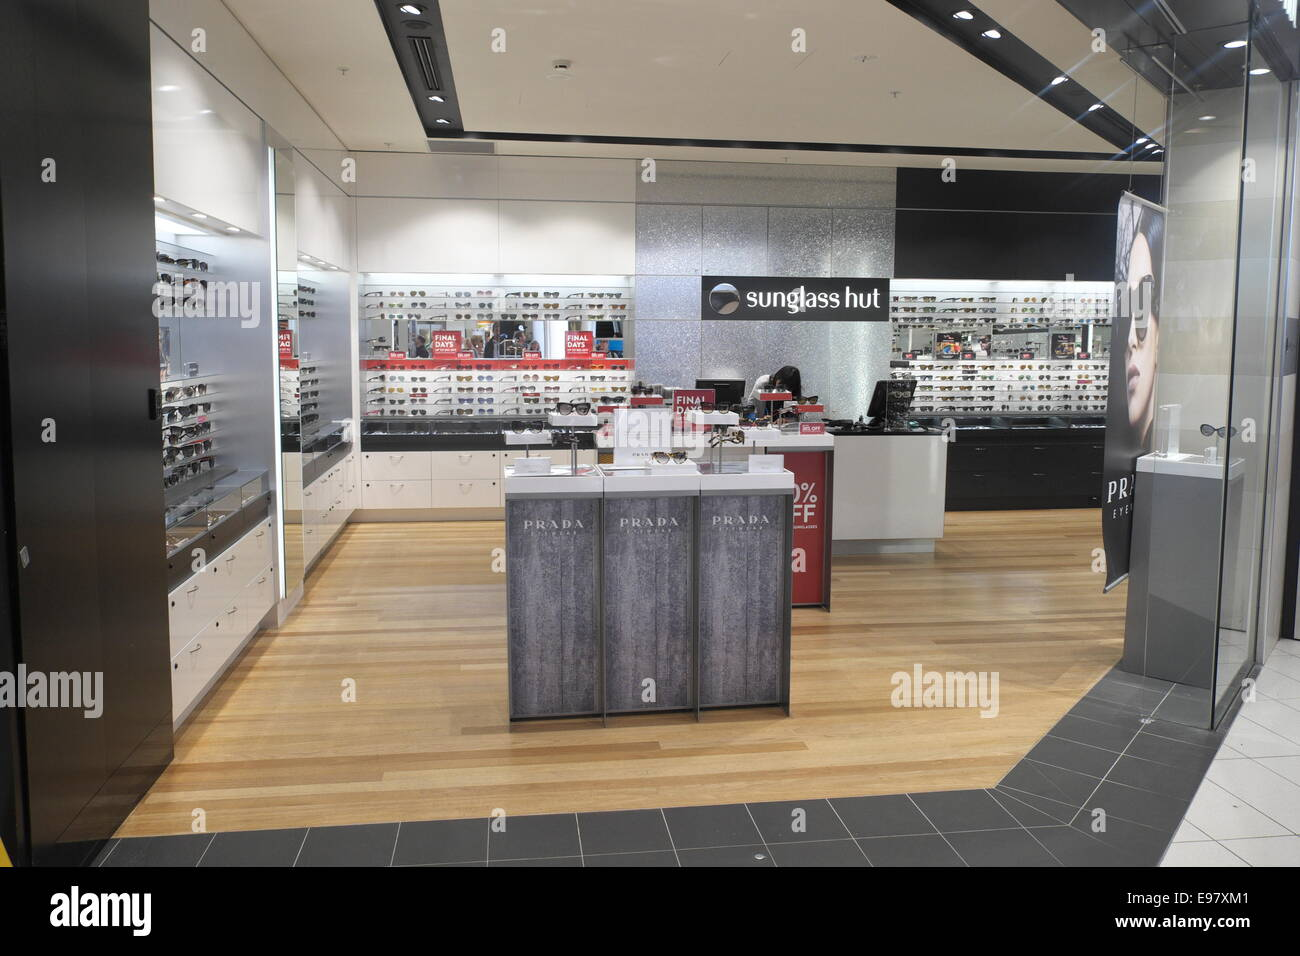 0410756cc5 sunglasses hut store sydney airport departure lounge terminal 2 concourse  area